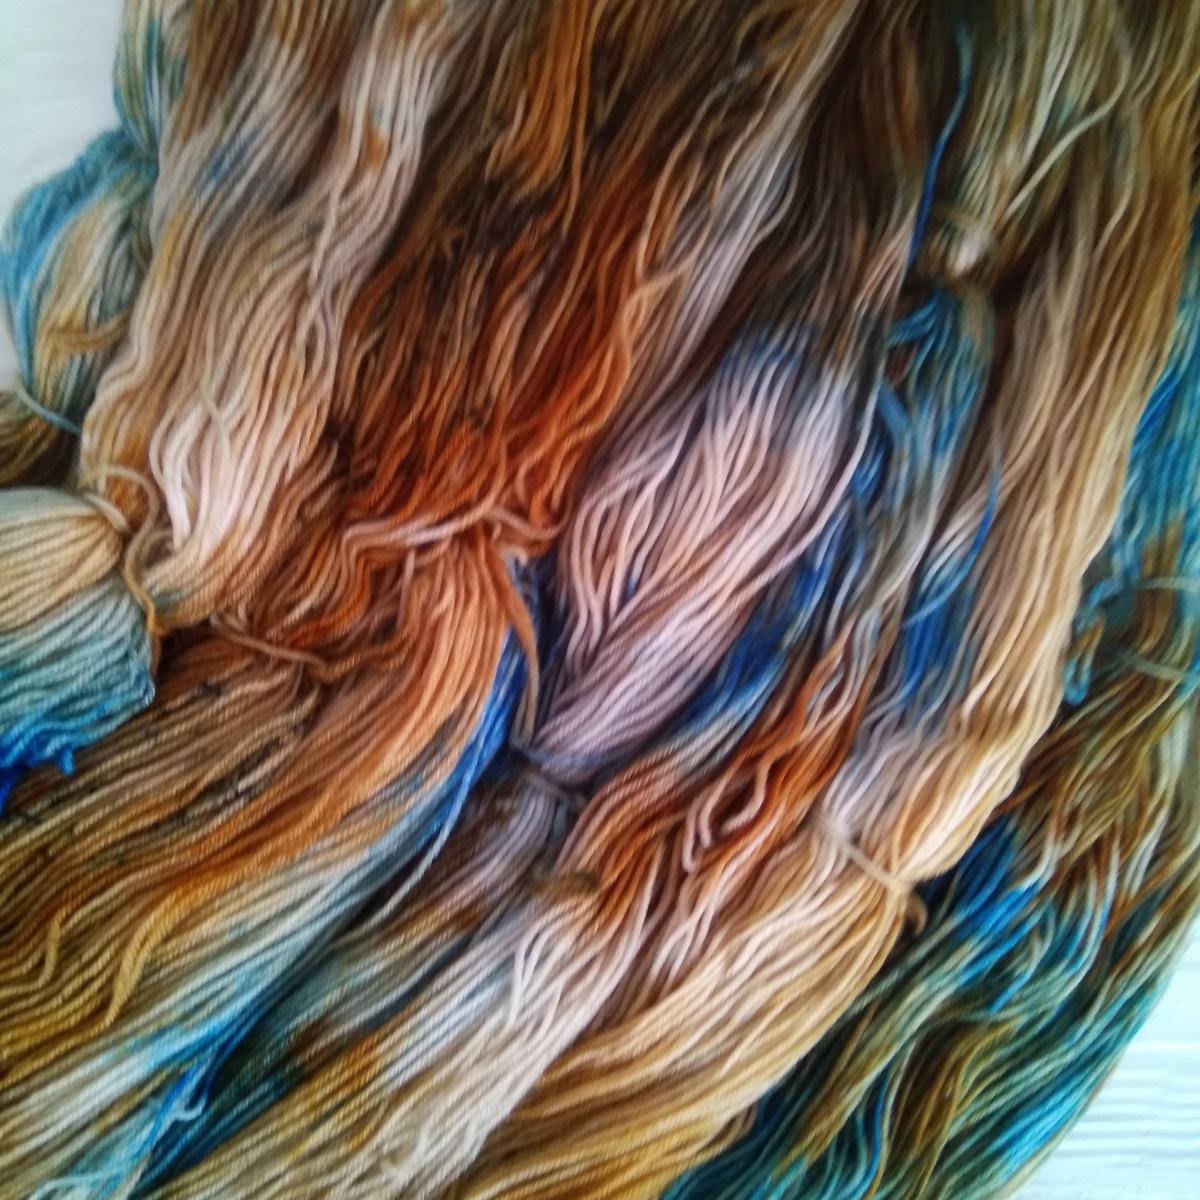 woodico.pro hand dyed yarn 036 2 1200x1200 - Hand dyed yarn / 036